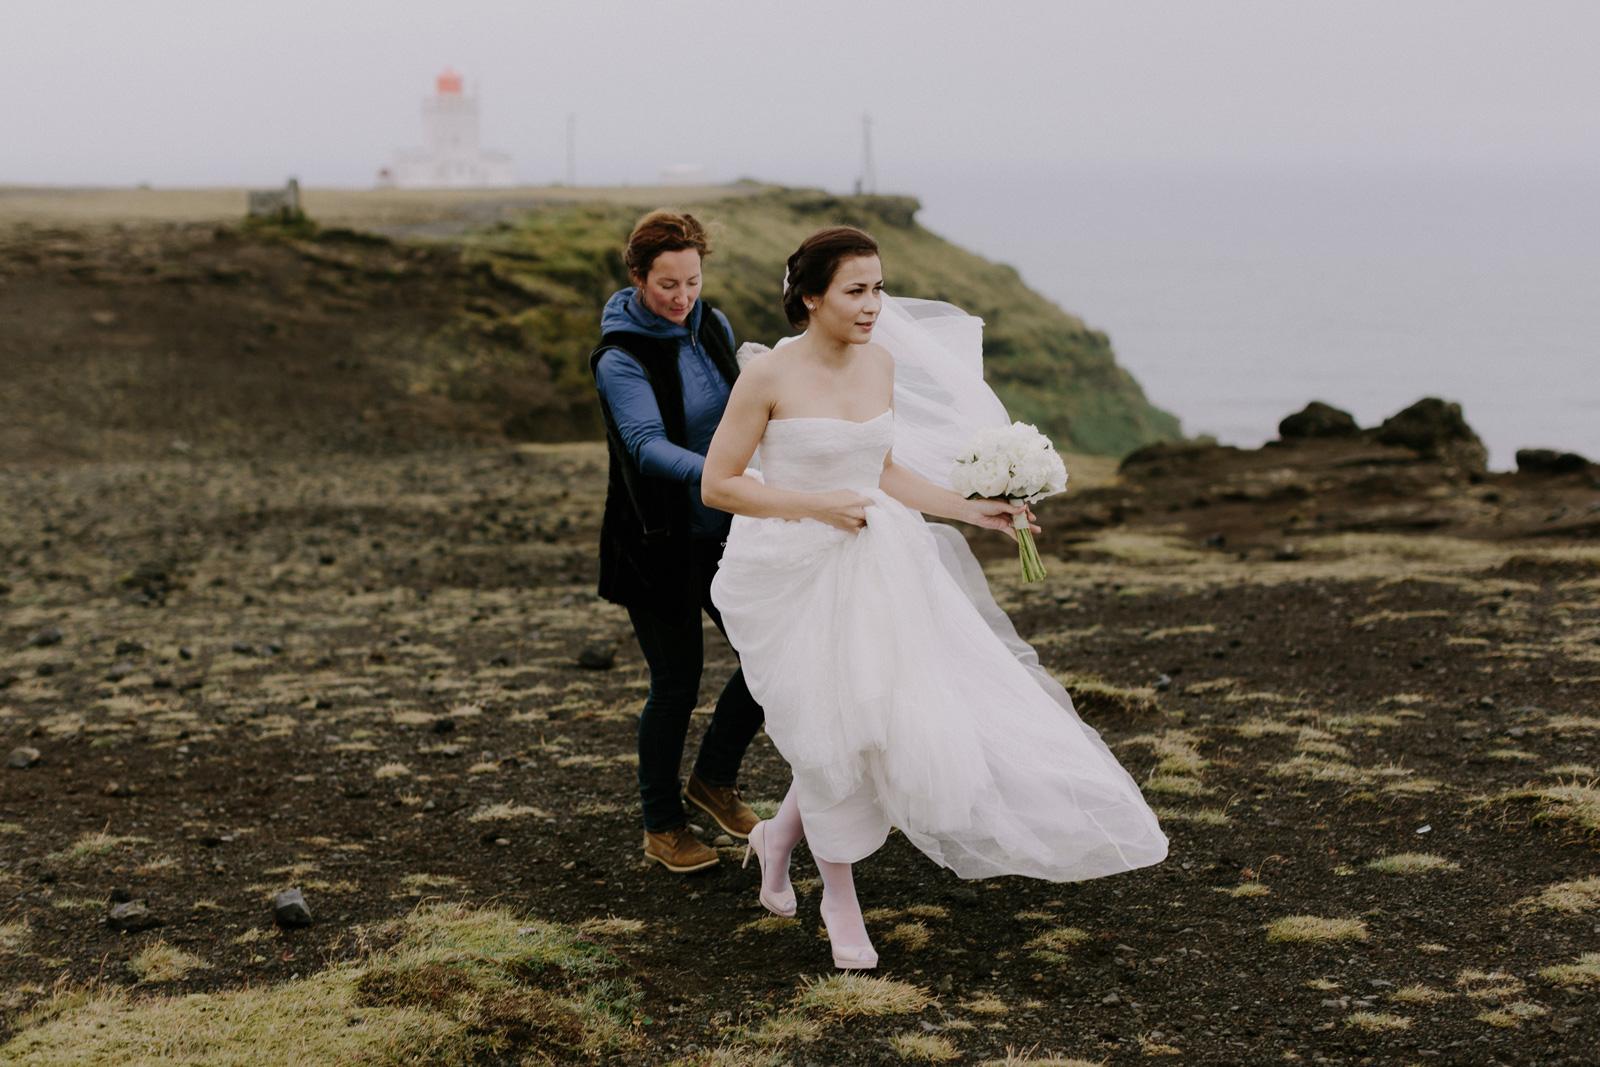 vik-wedding-photographer